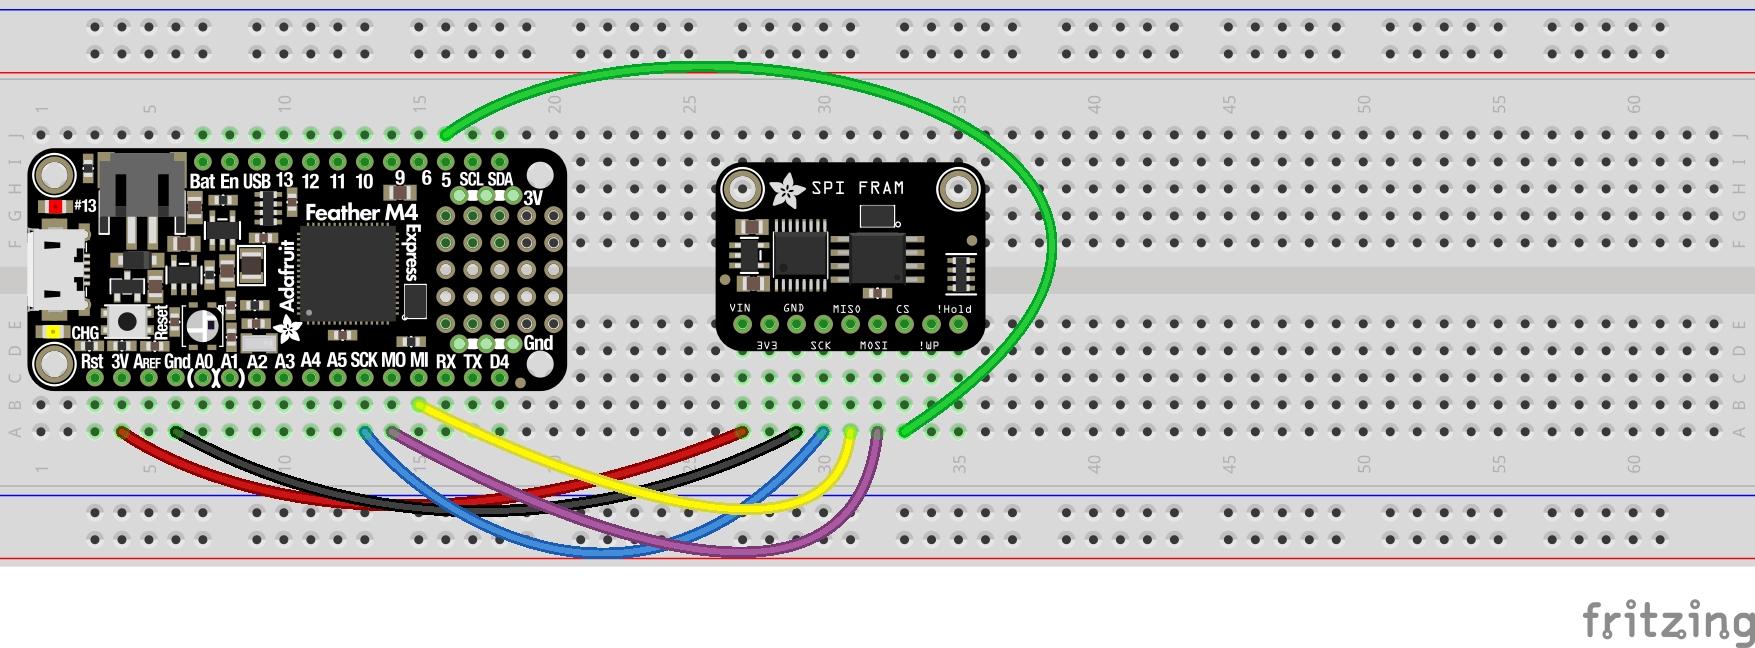 components_SPI_FRAM_FeatherM4_bb.jpg